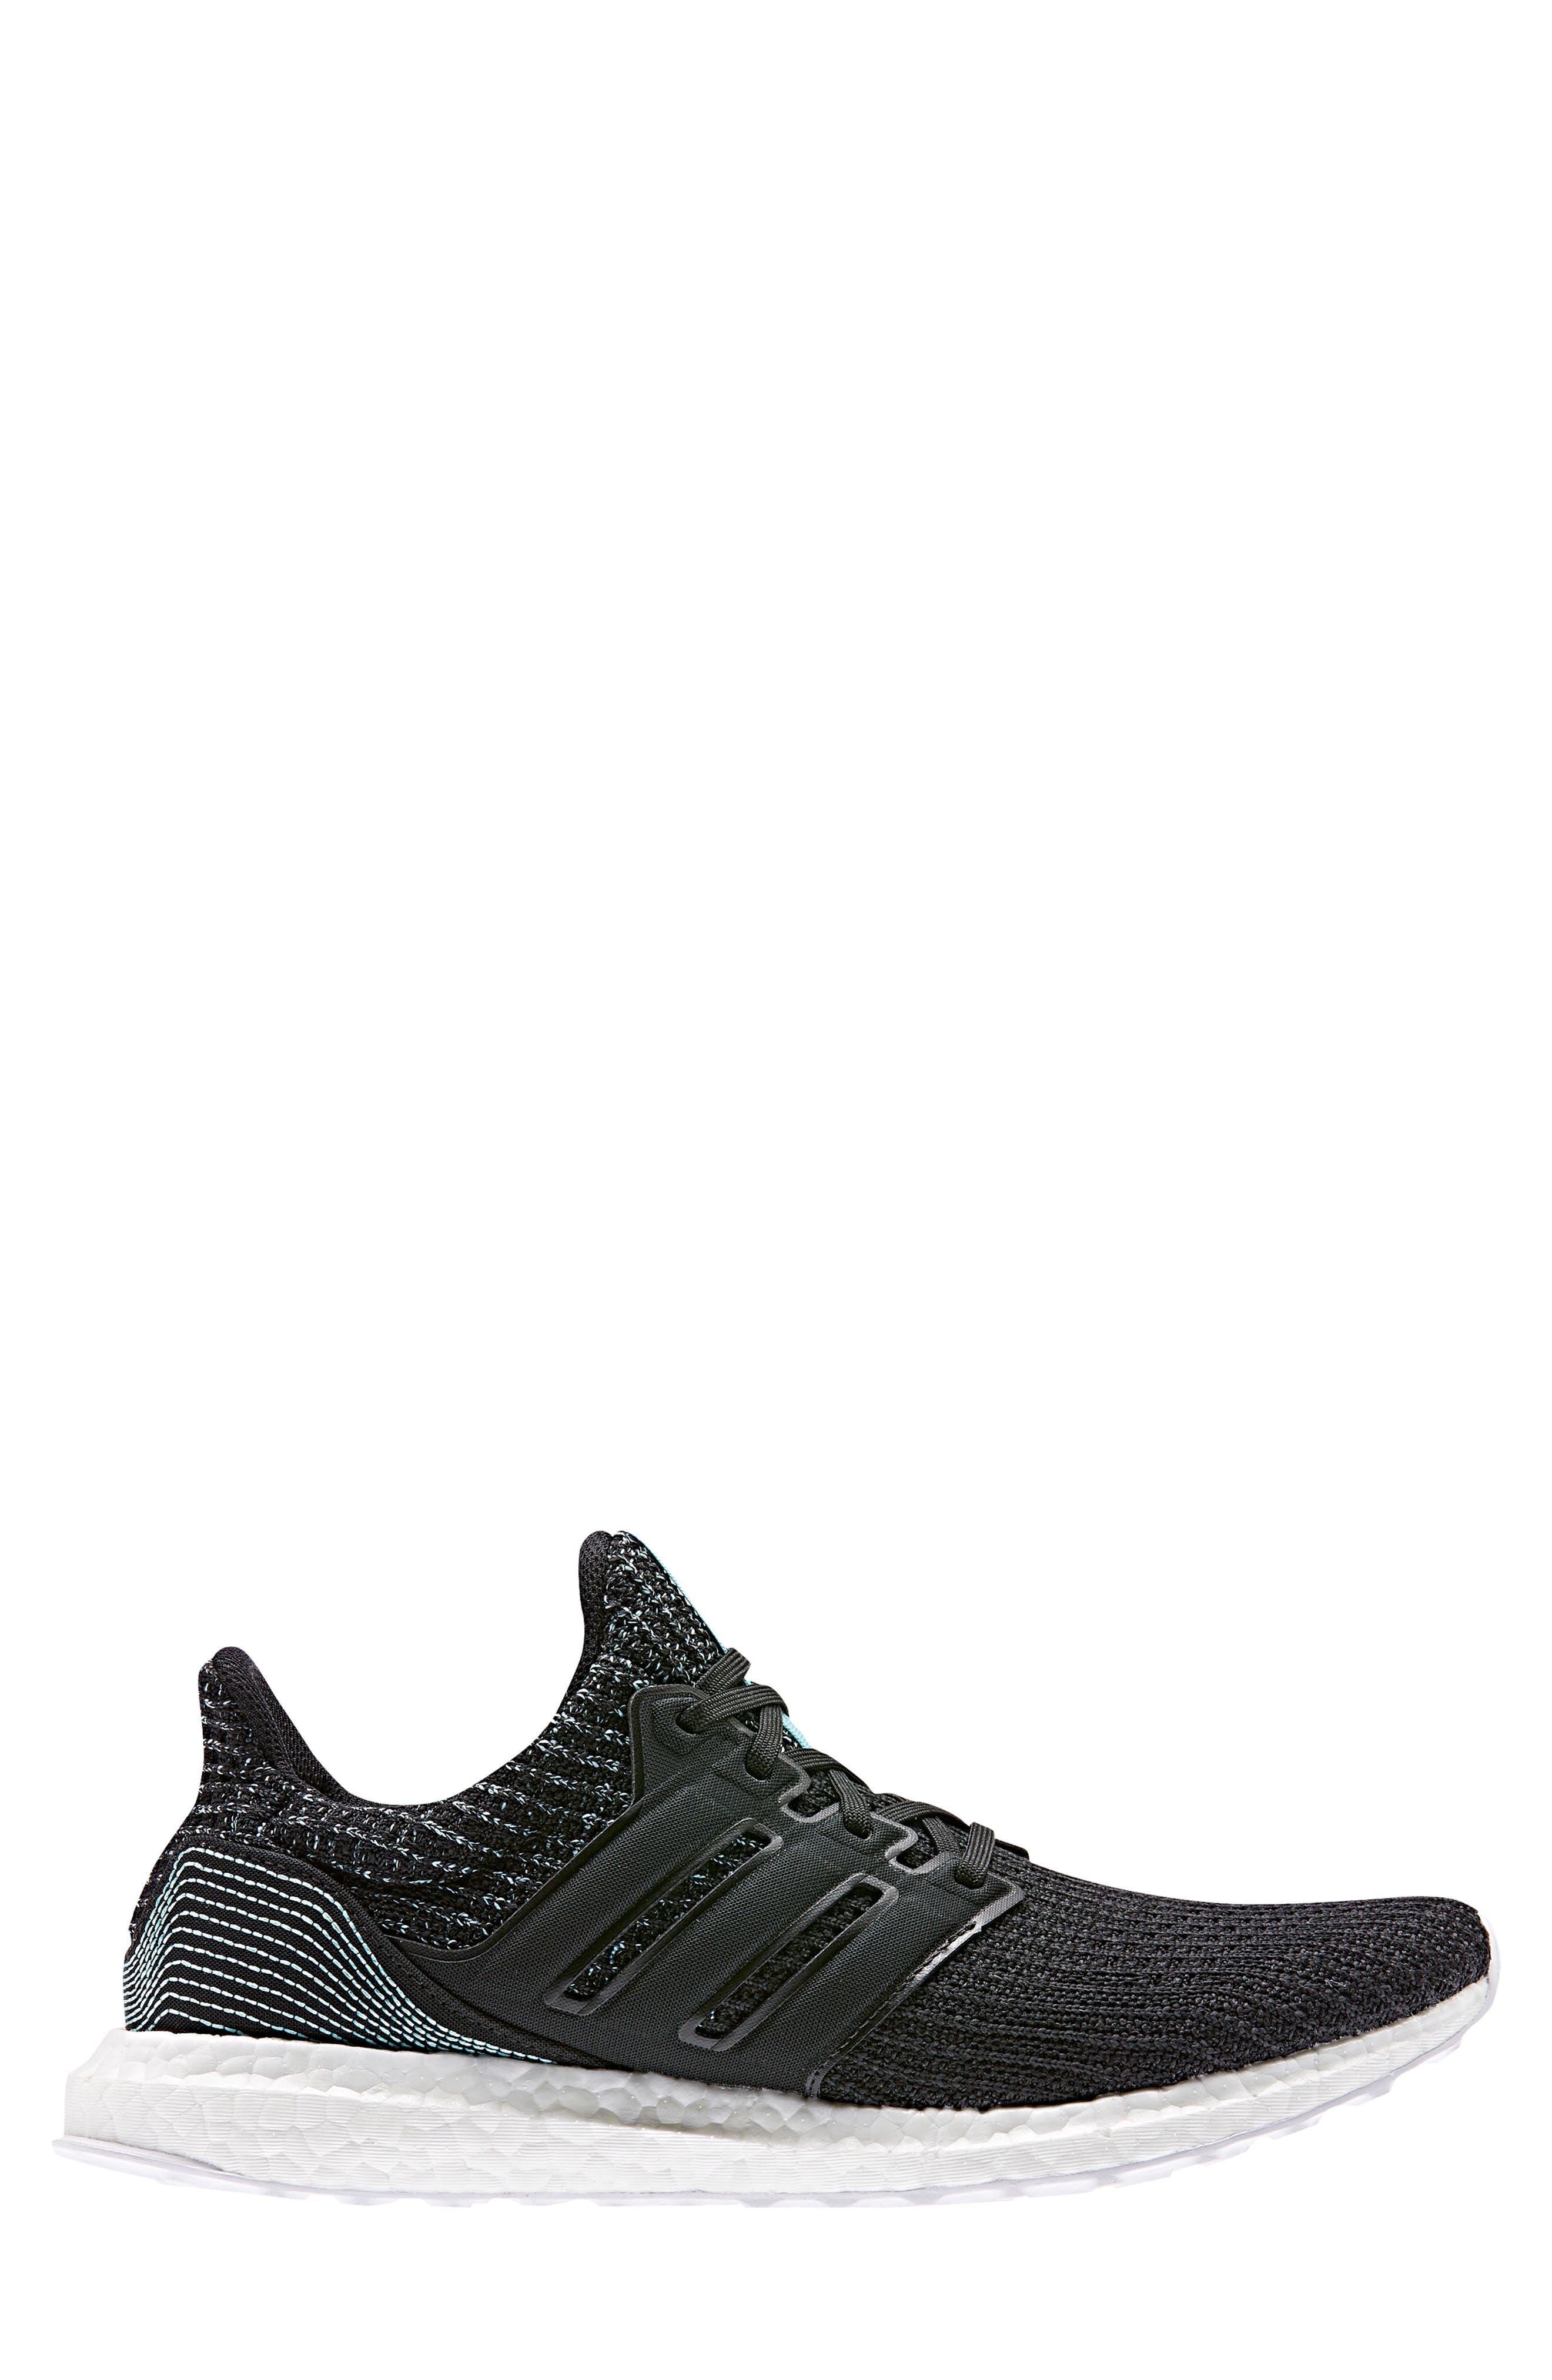 Parley UltraBoost Sneaker,                             Alternate thumbnail 3, color,                             001